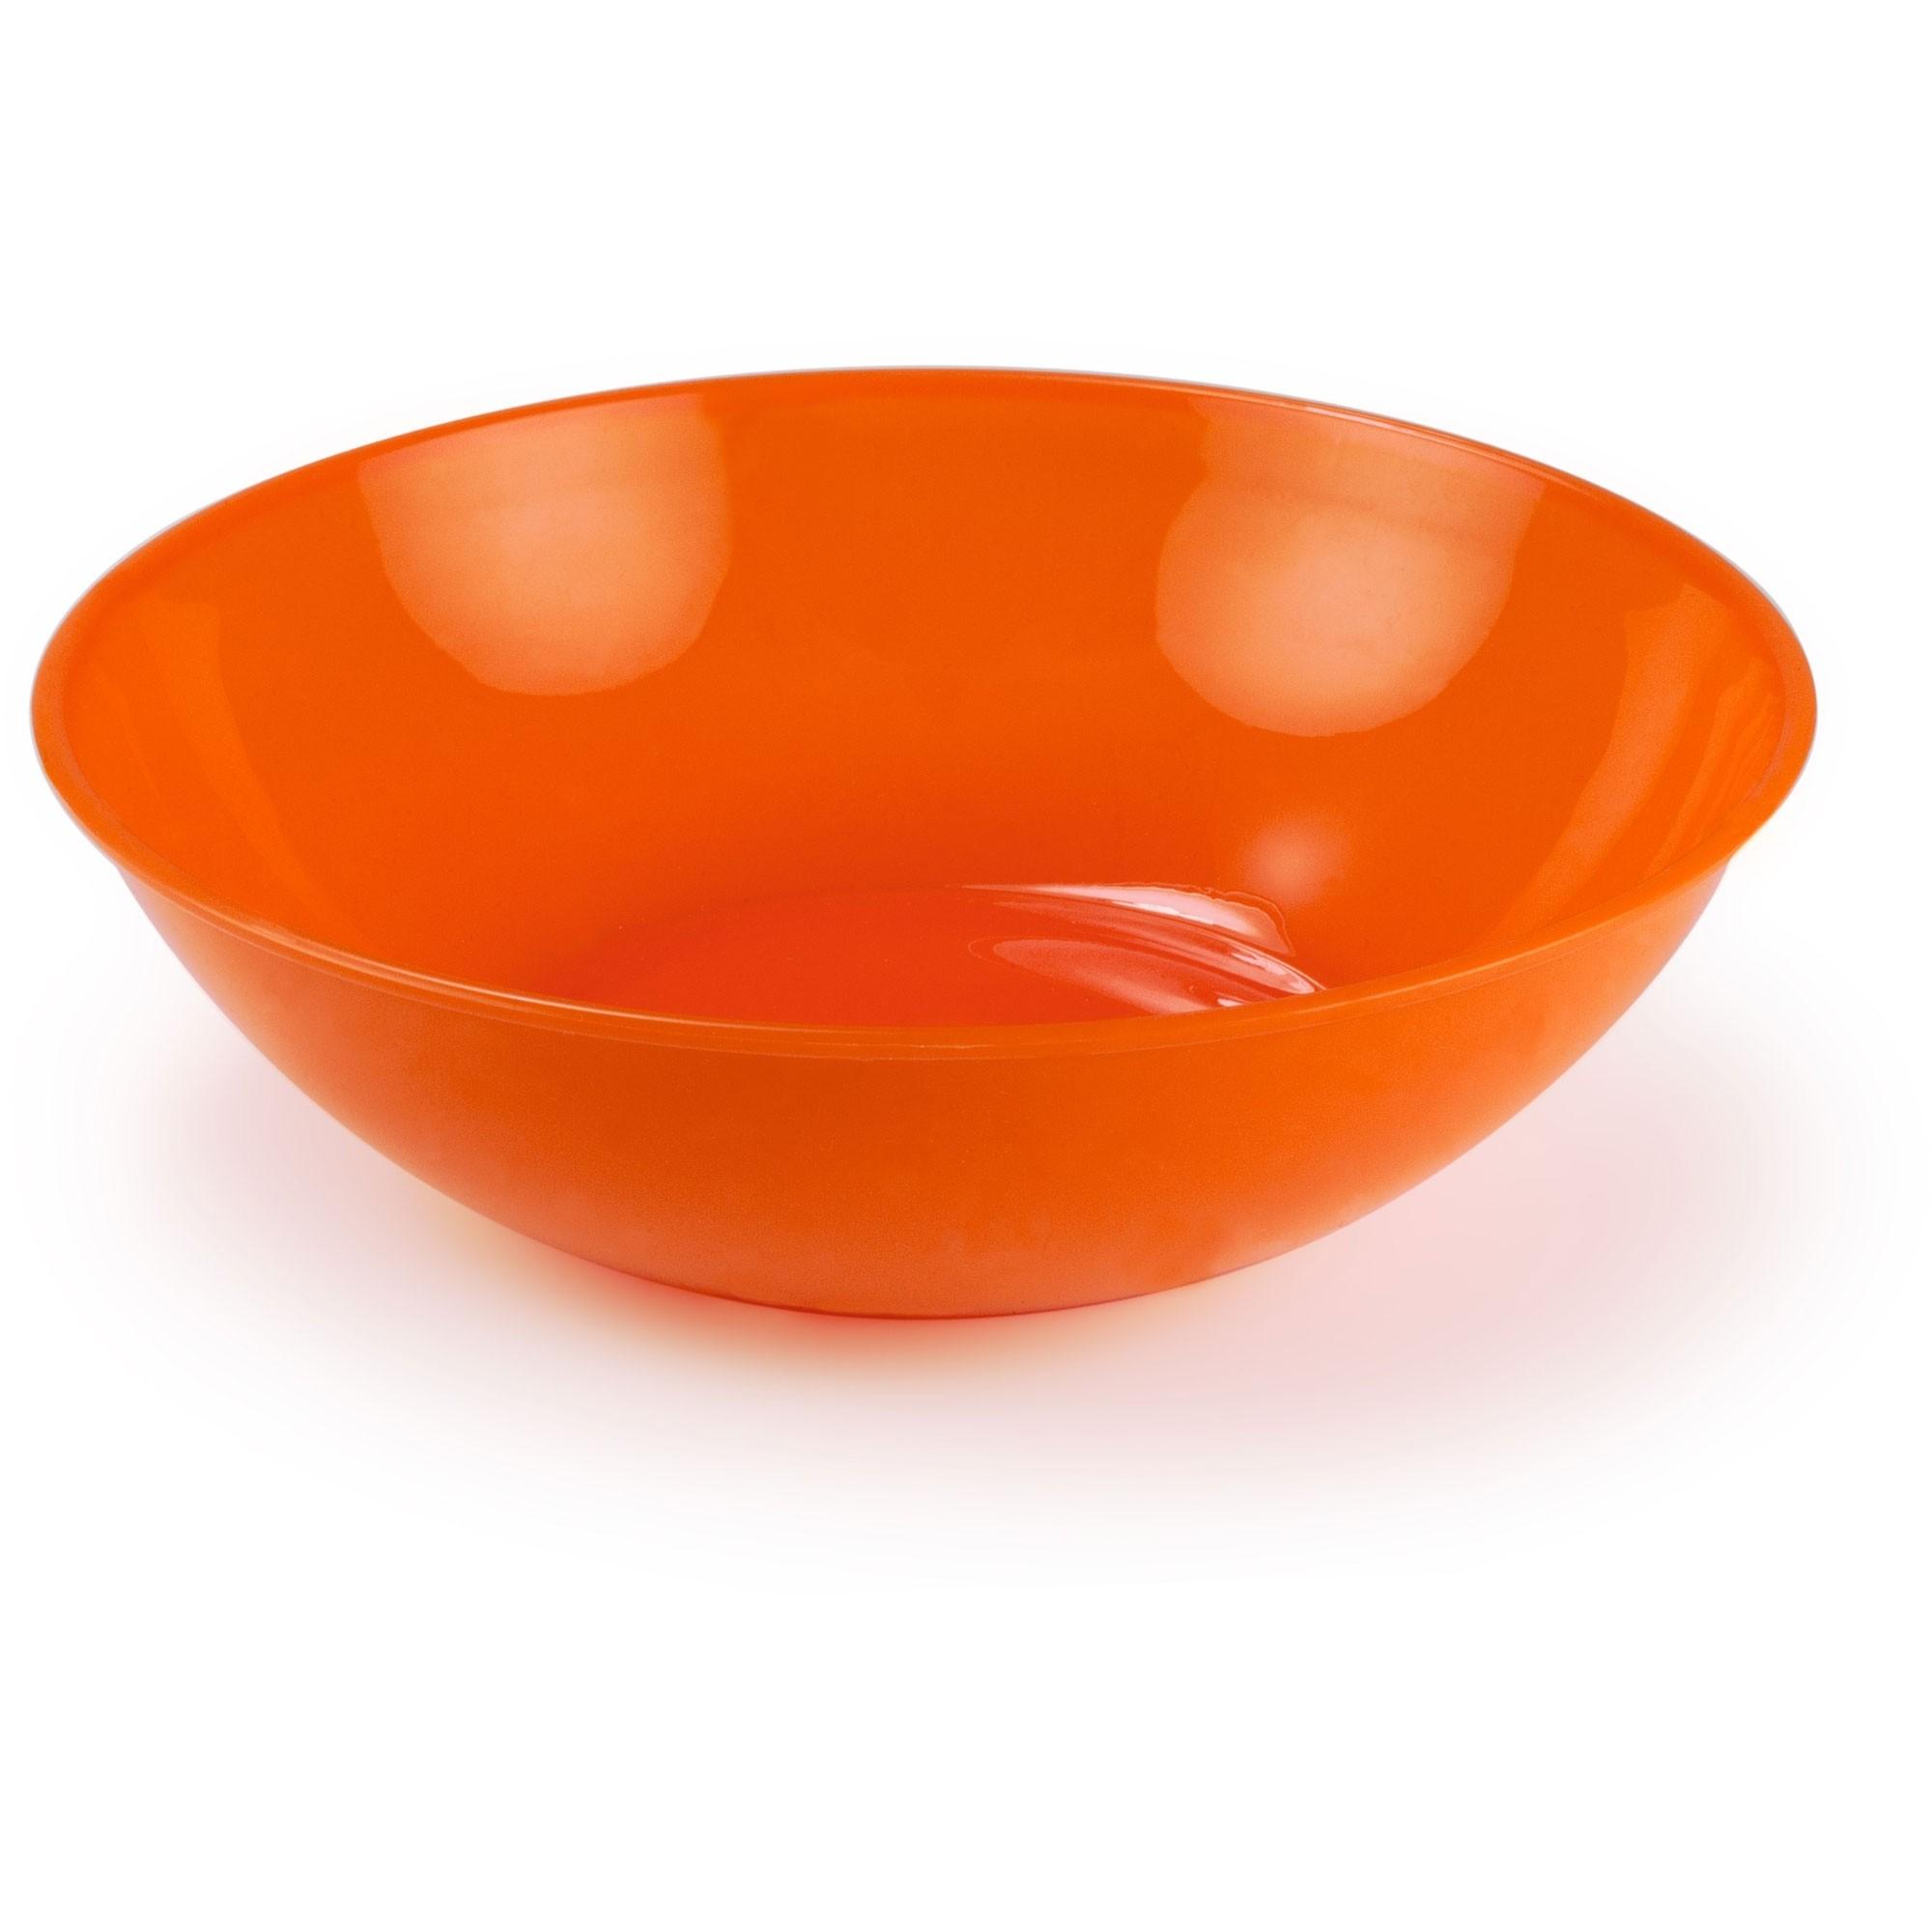 GSI Cascadian Bowl - Orange